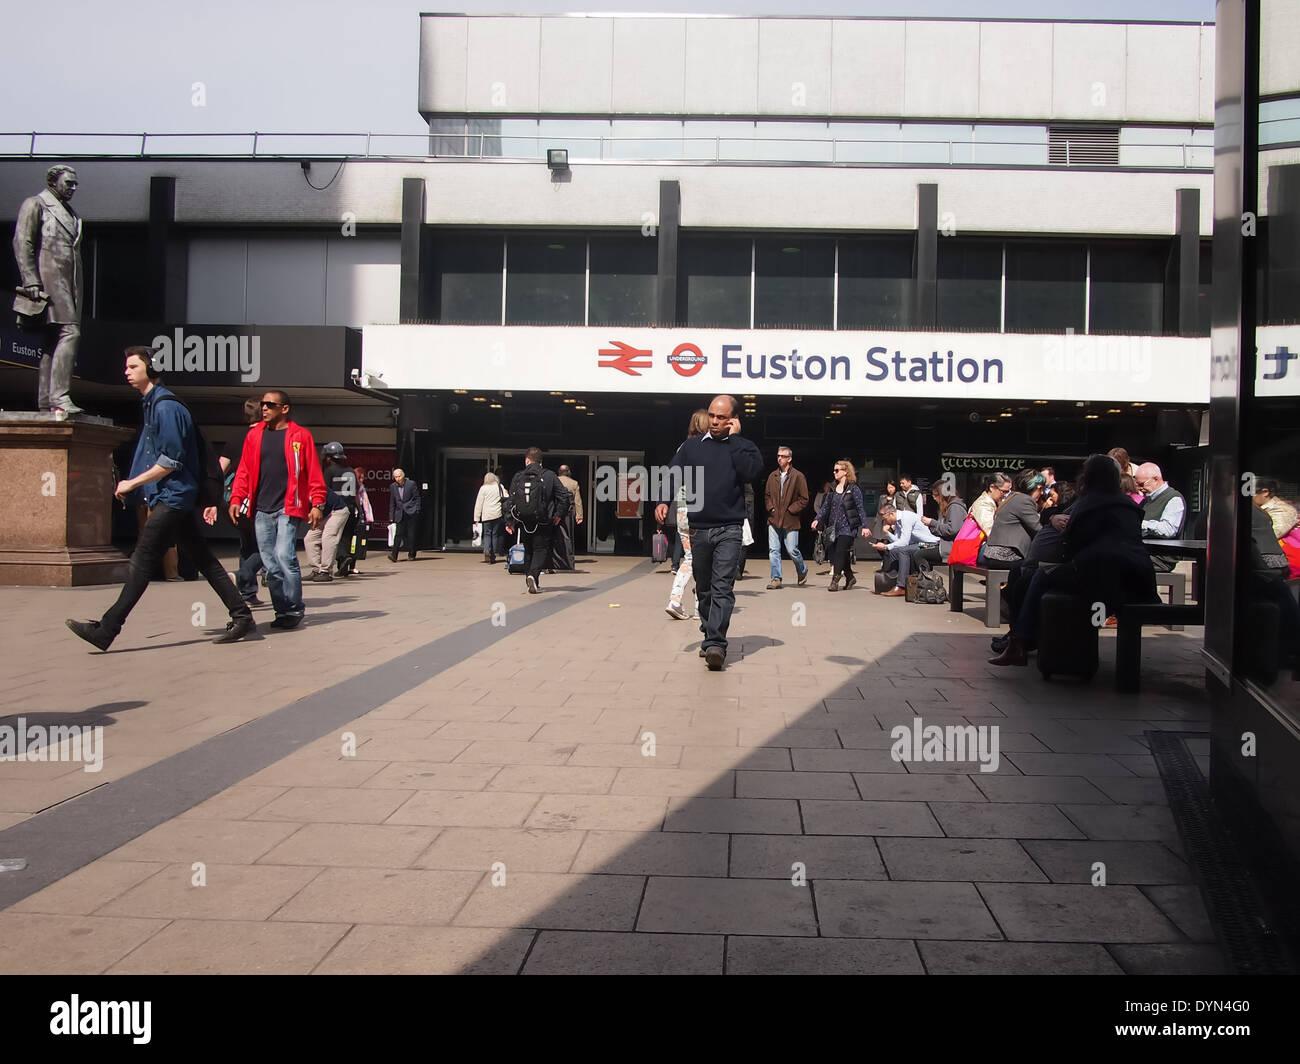 The entrance to Euston train station, London, England. - Stock Image